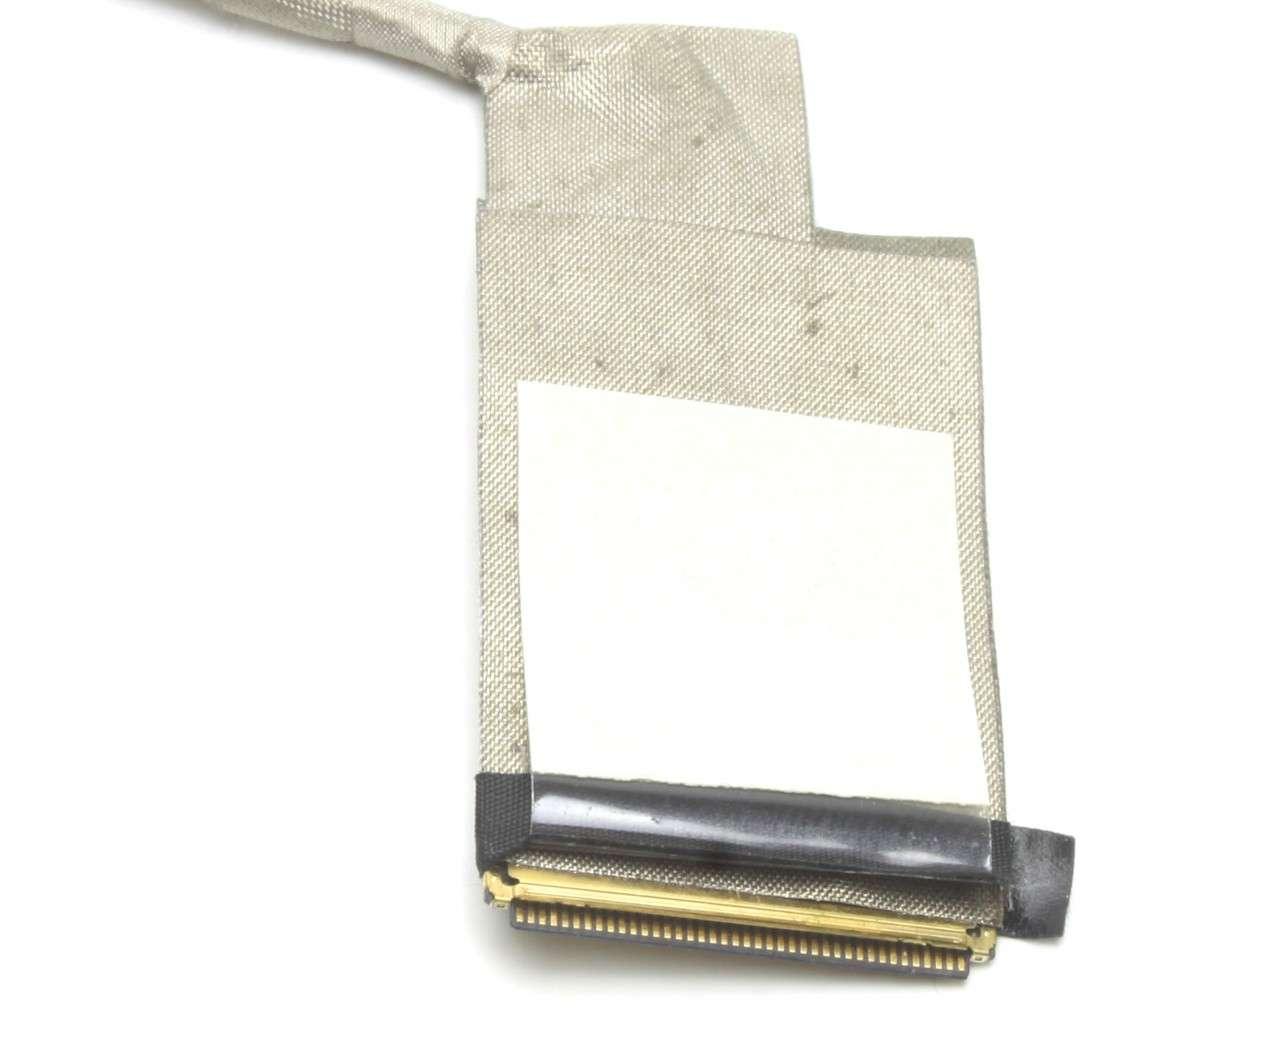 Cablu video LVDS Sony Vaio SVE17 imagine powerlaptop.ro 2021